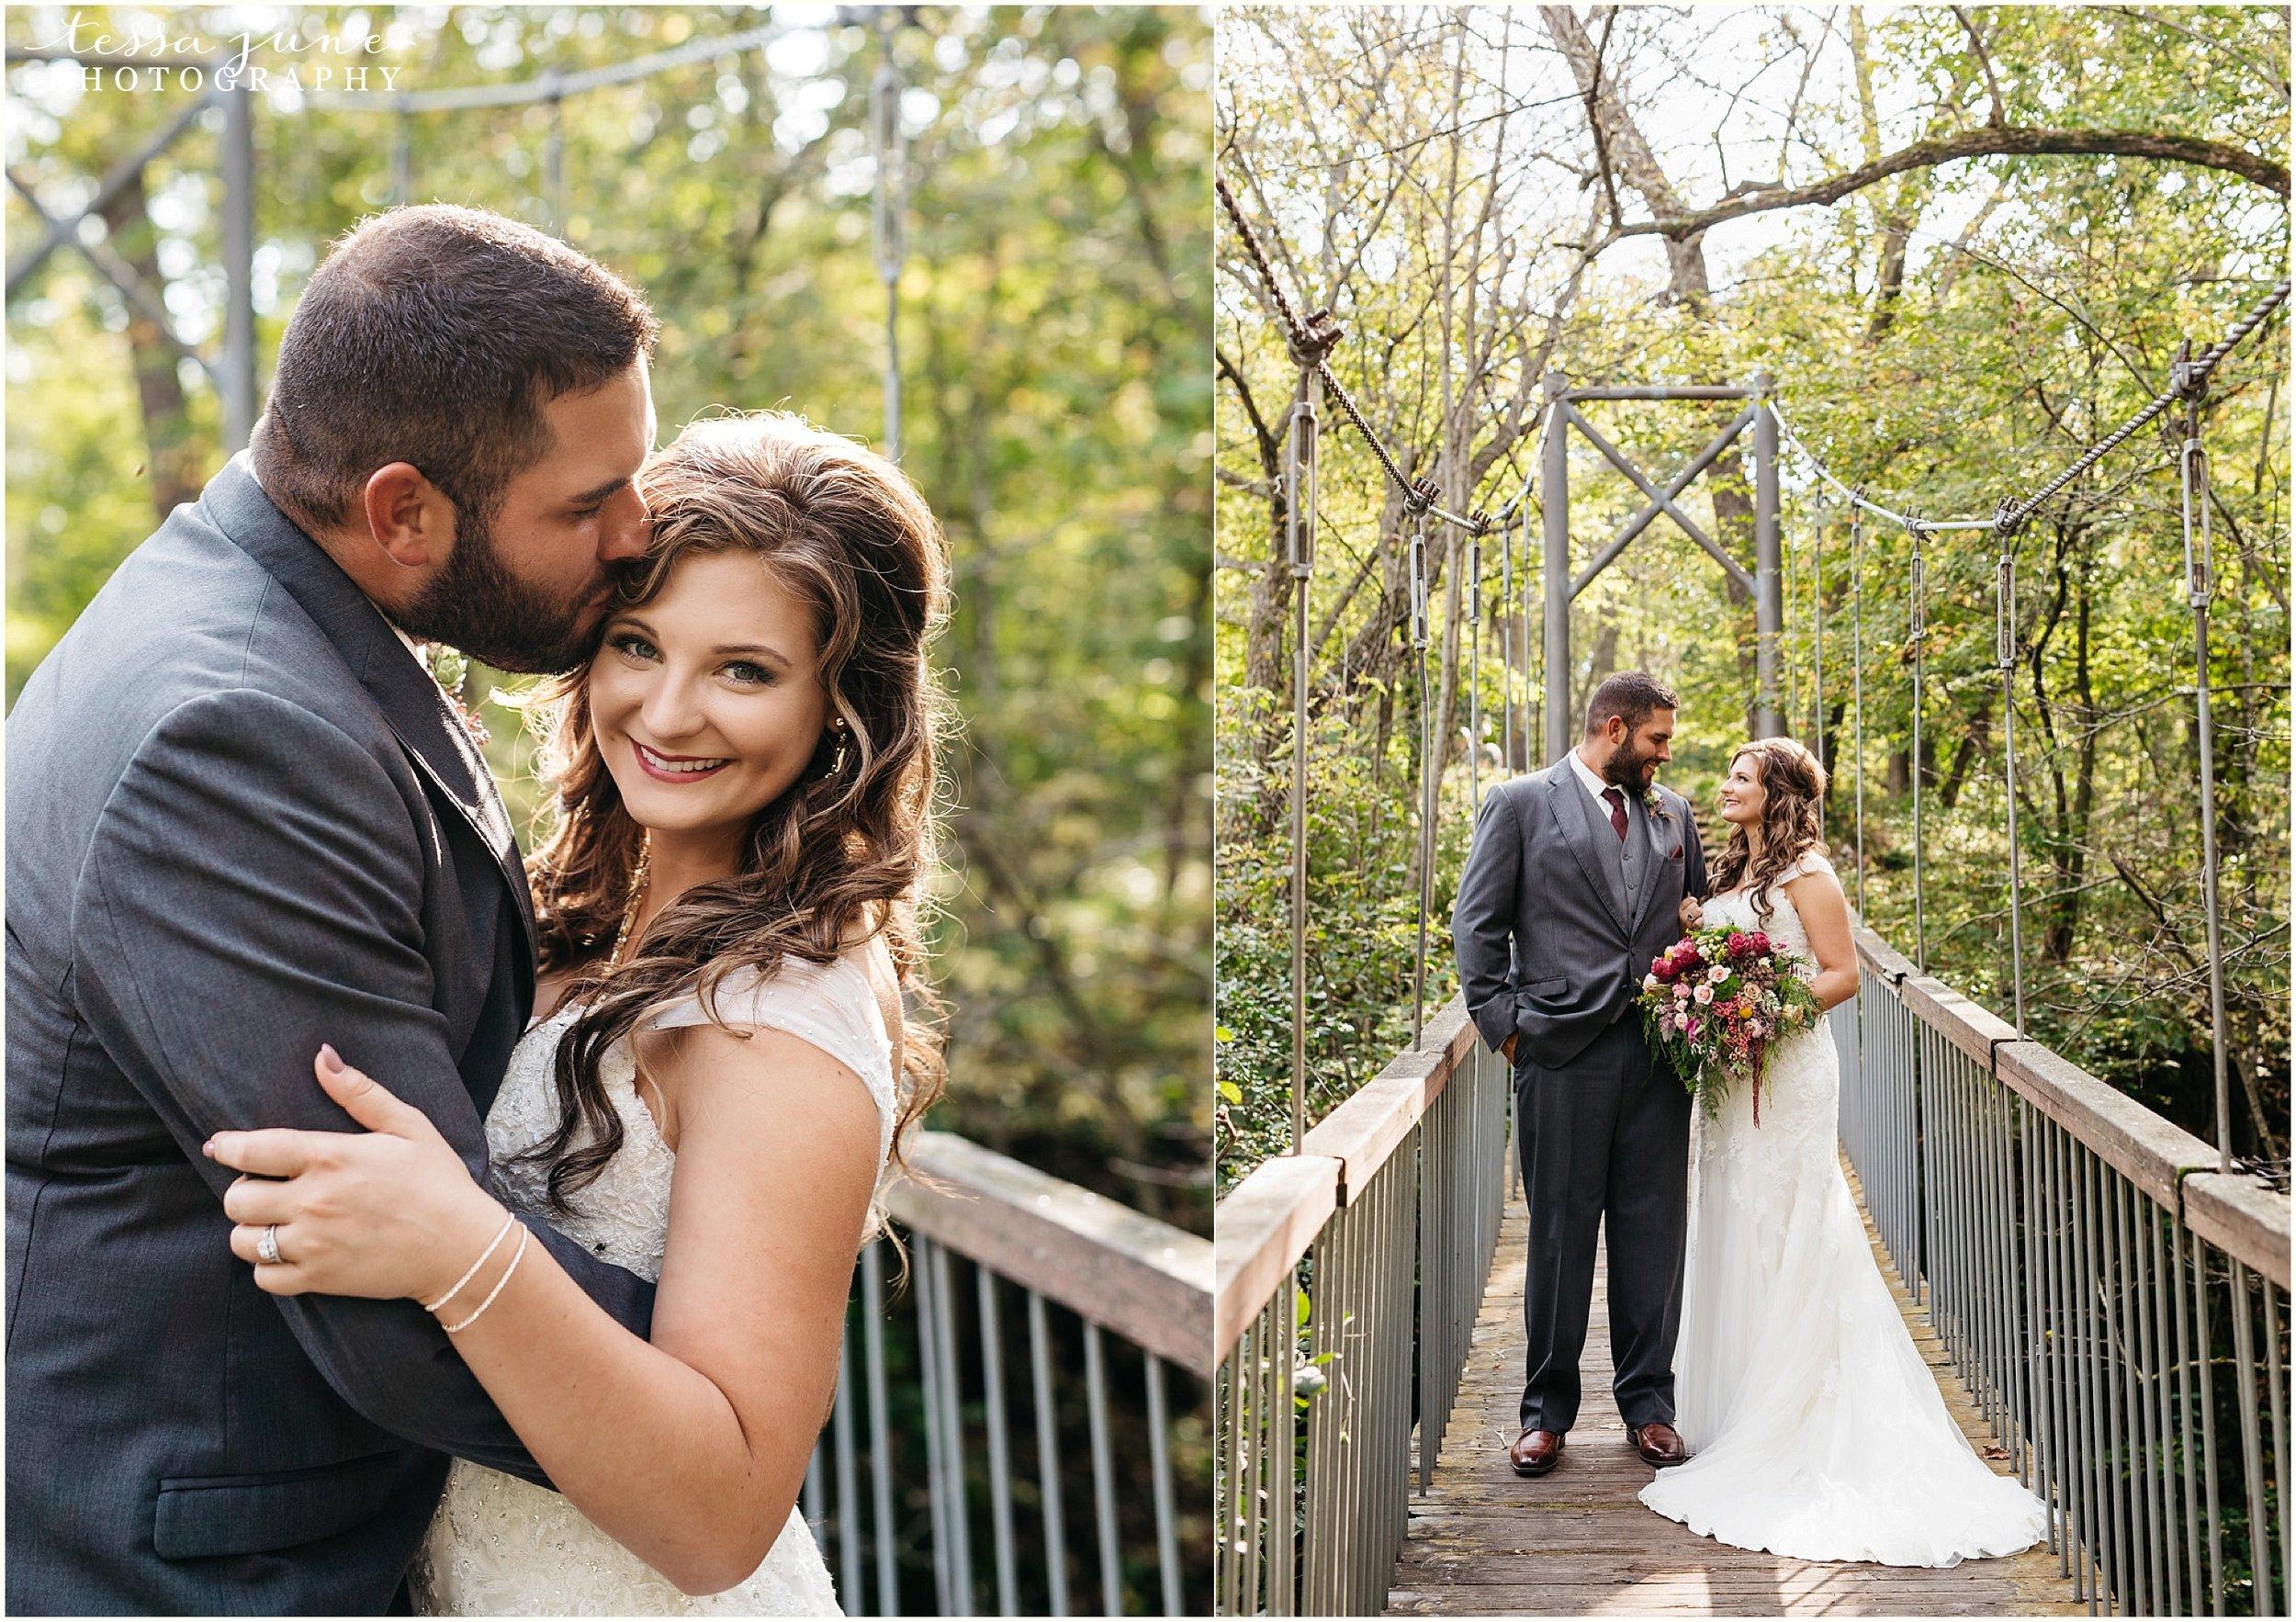 bohemian-minnesota-wedding-mismatched-bridesmaid-dresses-waterfall-st-cloud-tessa-june-photography-46.jpg